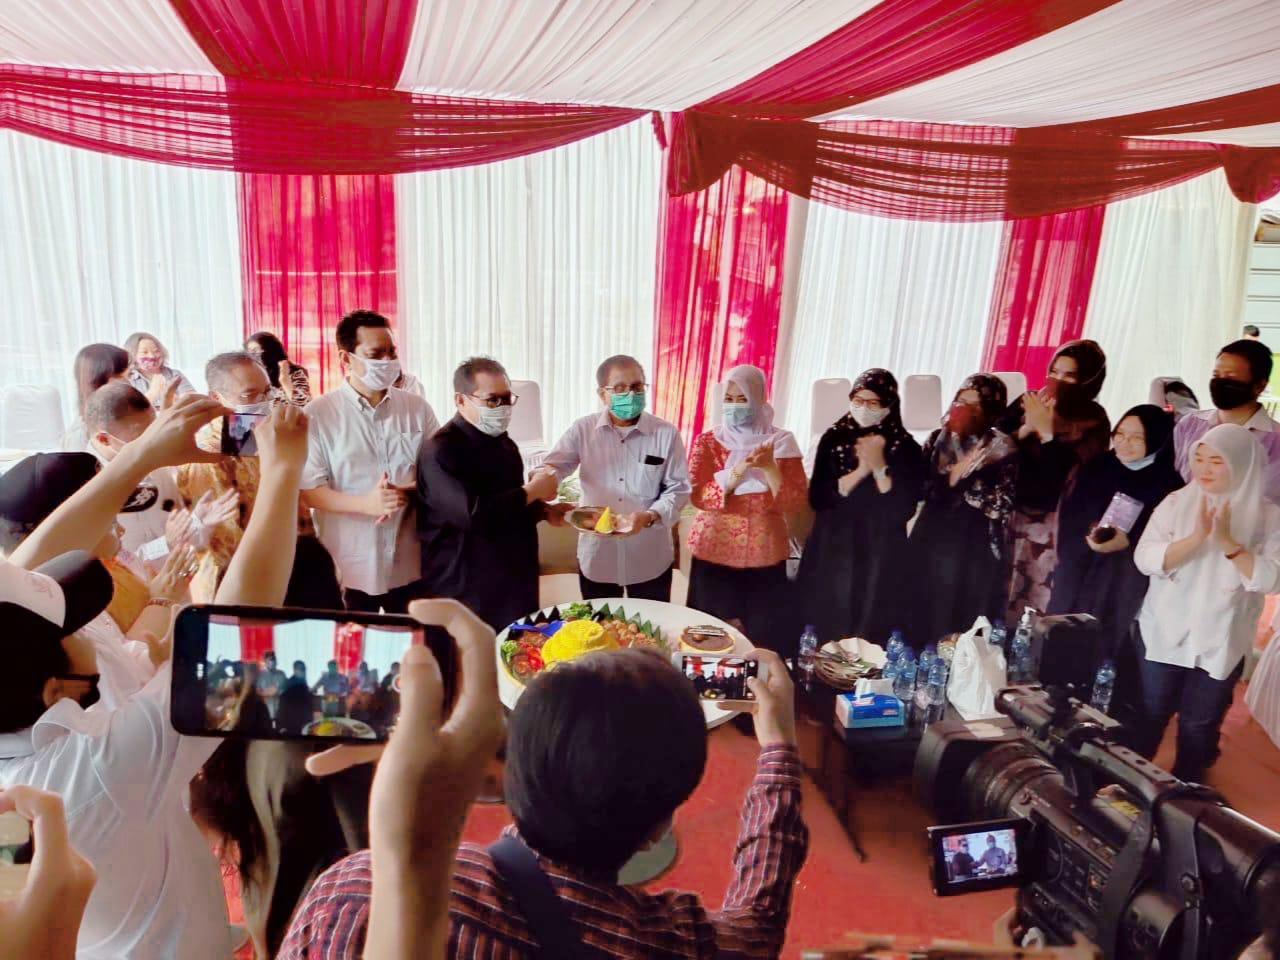 Pemberian tumpeng dari Ketua Umum SMSI Firdaus yang juga Komut Siberindo.co kepada Hendry Ch Bangun, Dirut Siberindo.co didampingi pengurus SMSI Pusat dan Daerah, di Graha Bintaro, Tangerang Selatan.